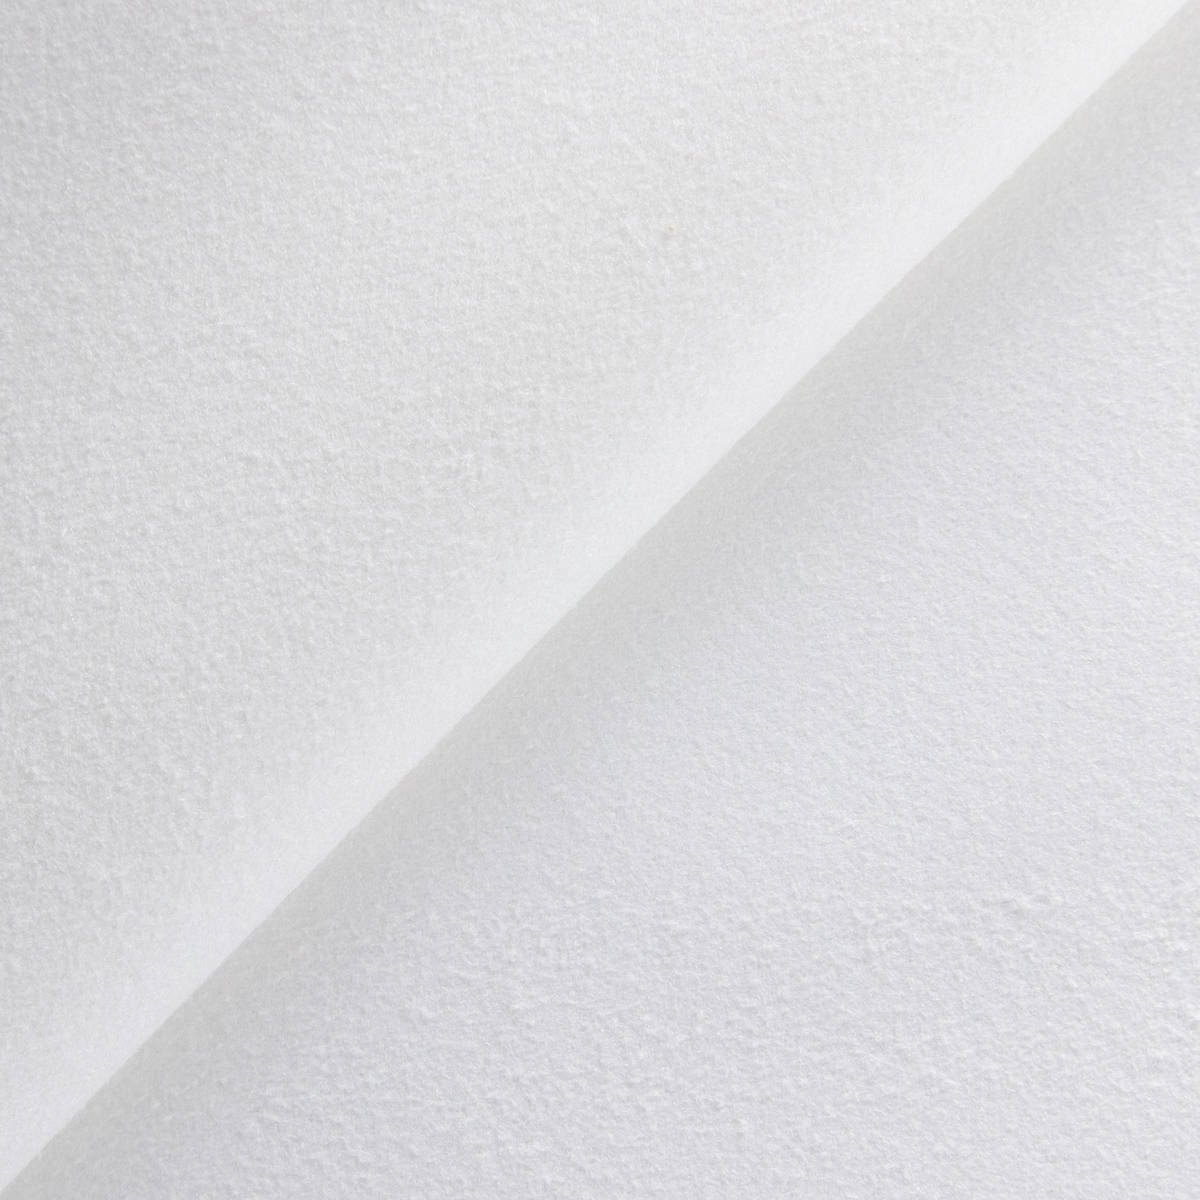 Microfibre Towel 190gsm